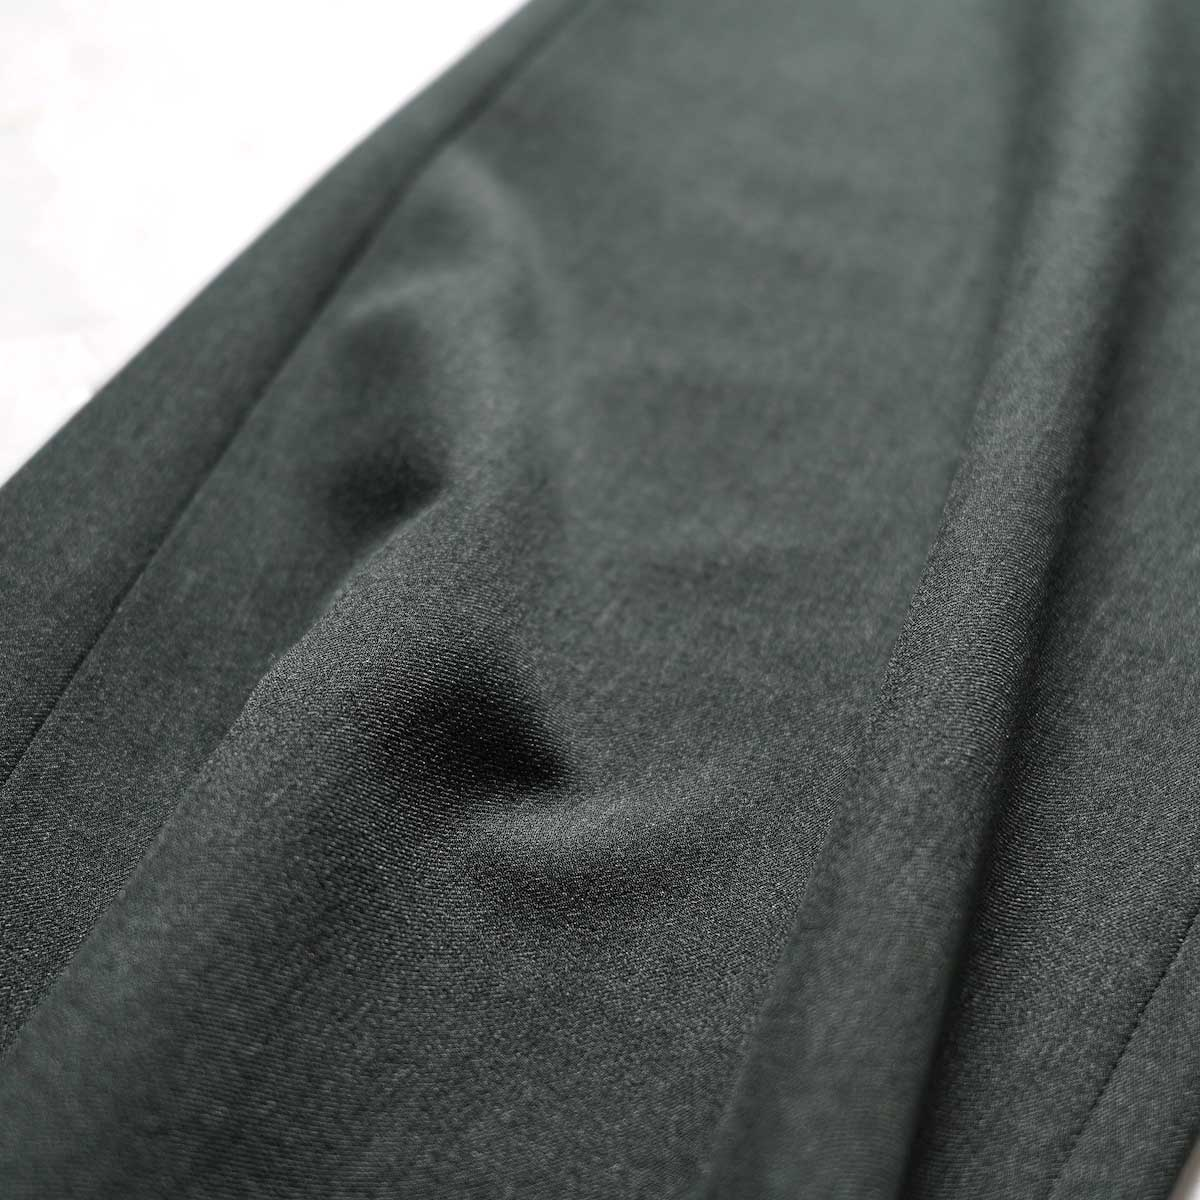 N.HOOLYWOOD / 2212-PT21-008 Flair Slacks (Charcoal)生地感